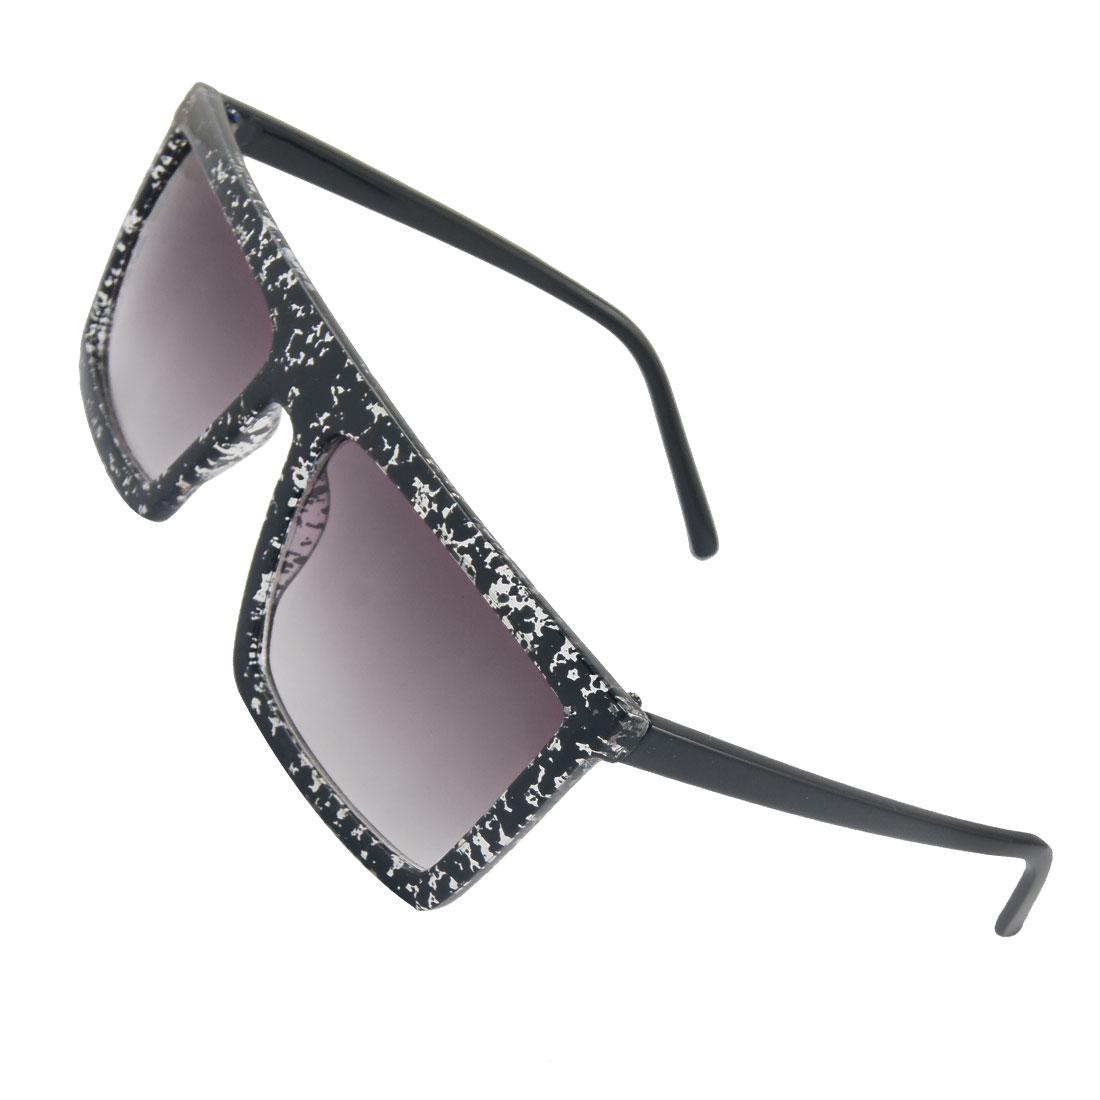 Unisex Black Clear Plastic Frame Rectangle Lens Sunglasses